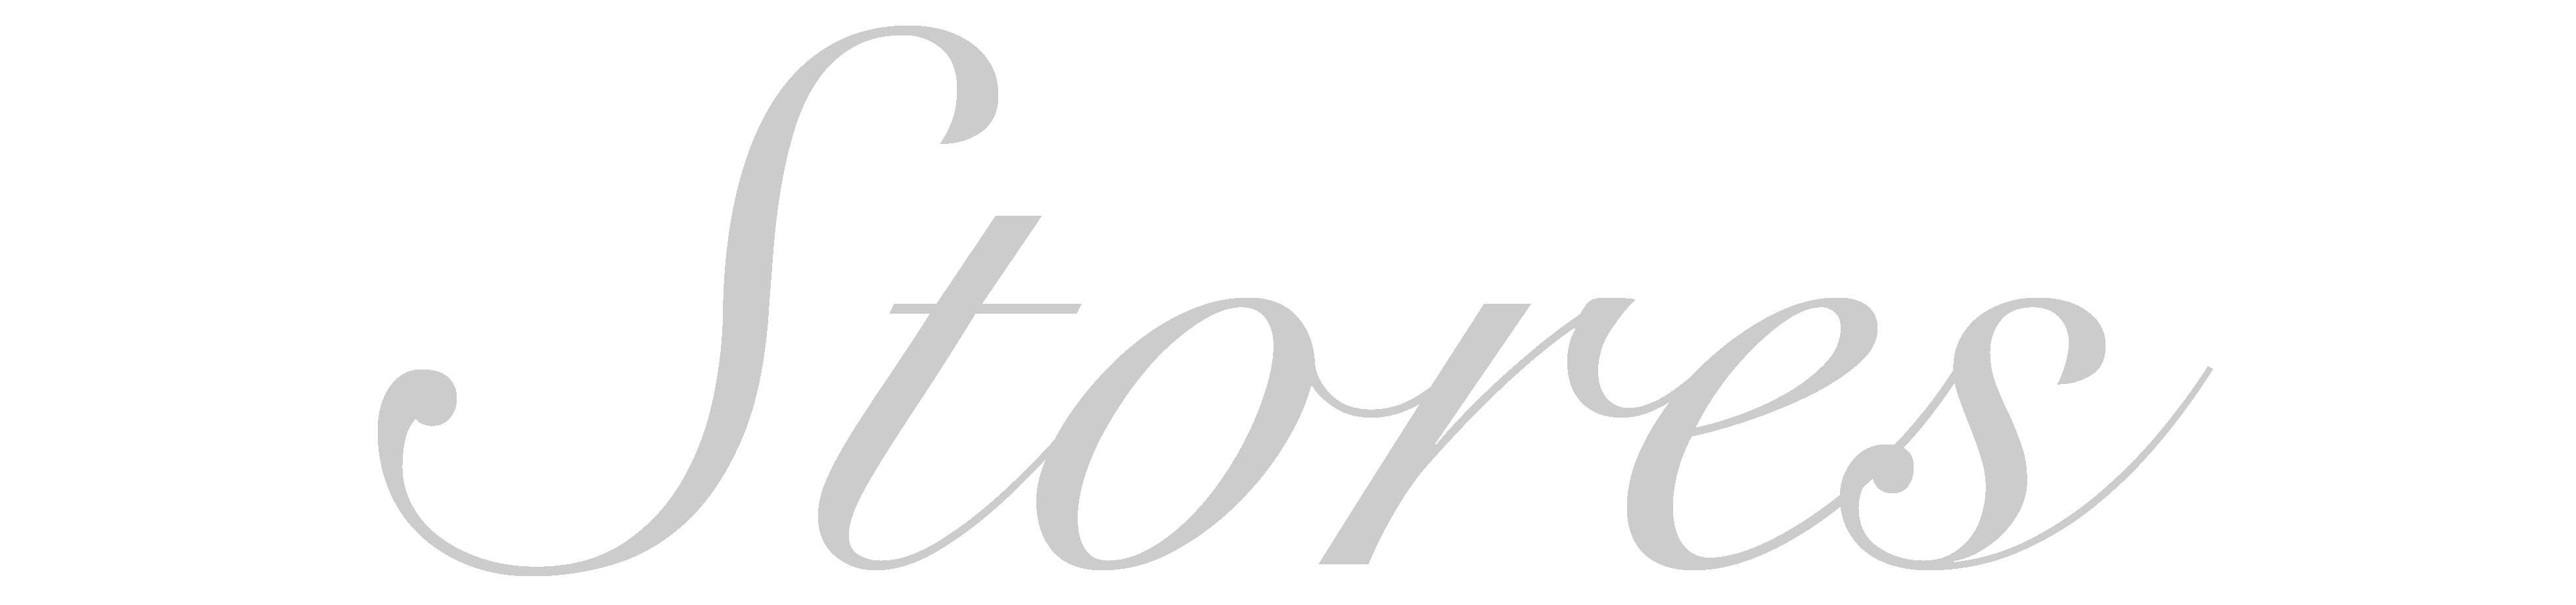 storelogoivy